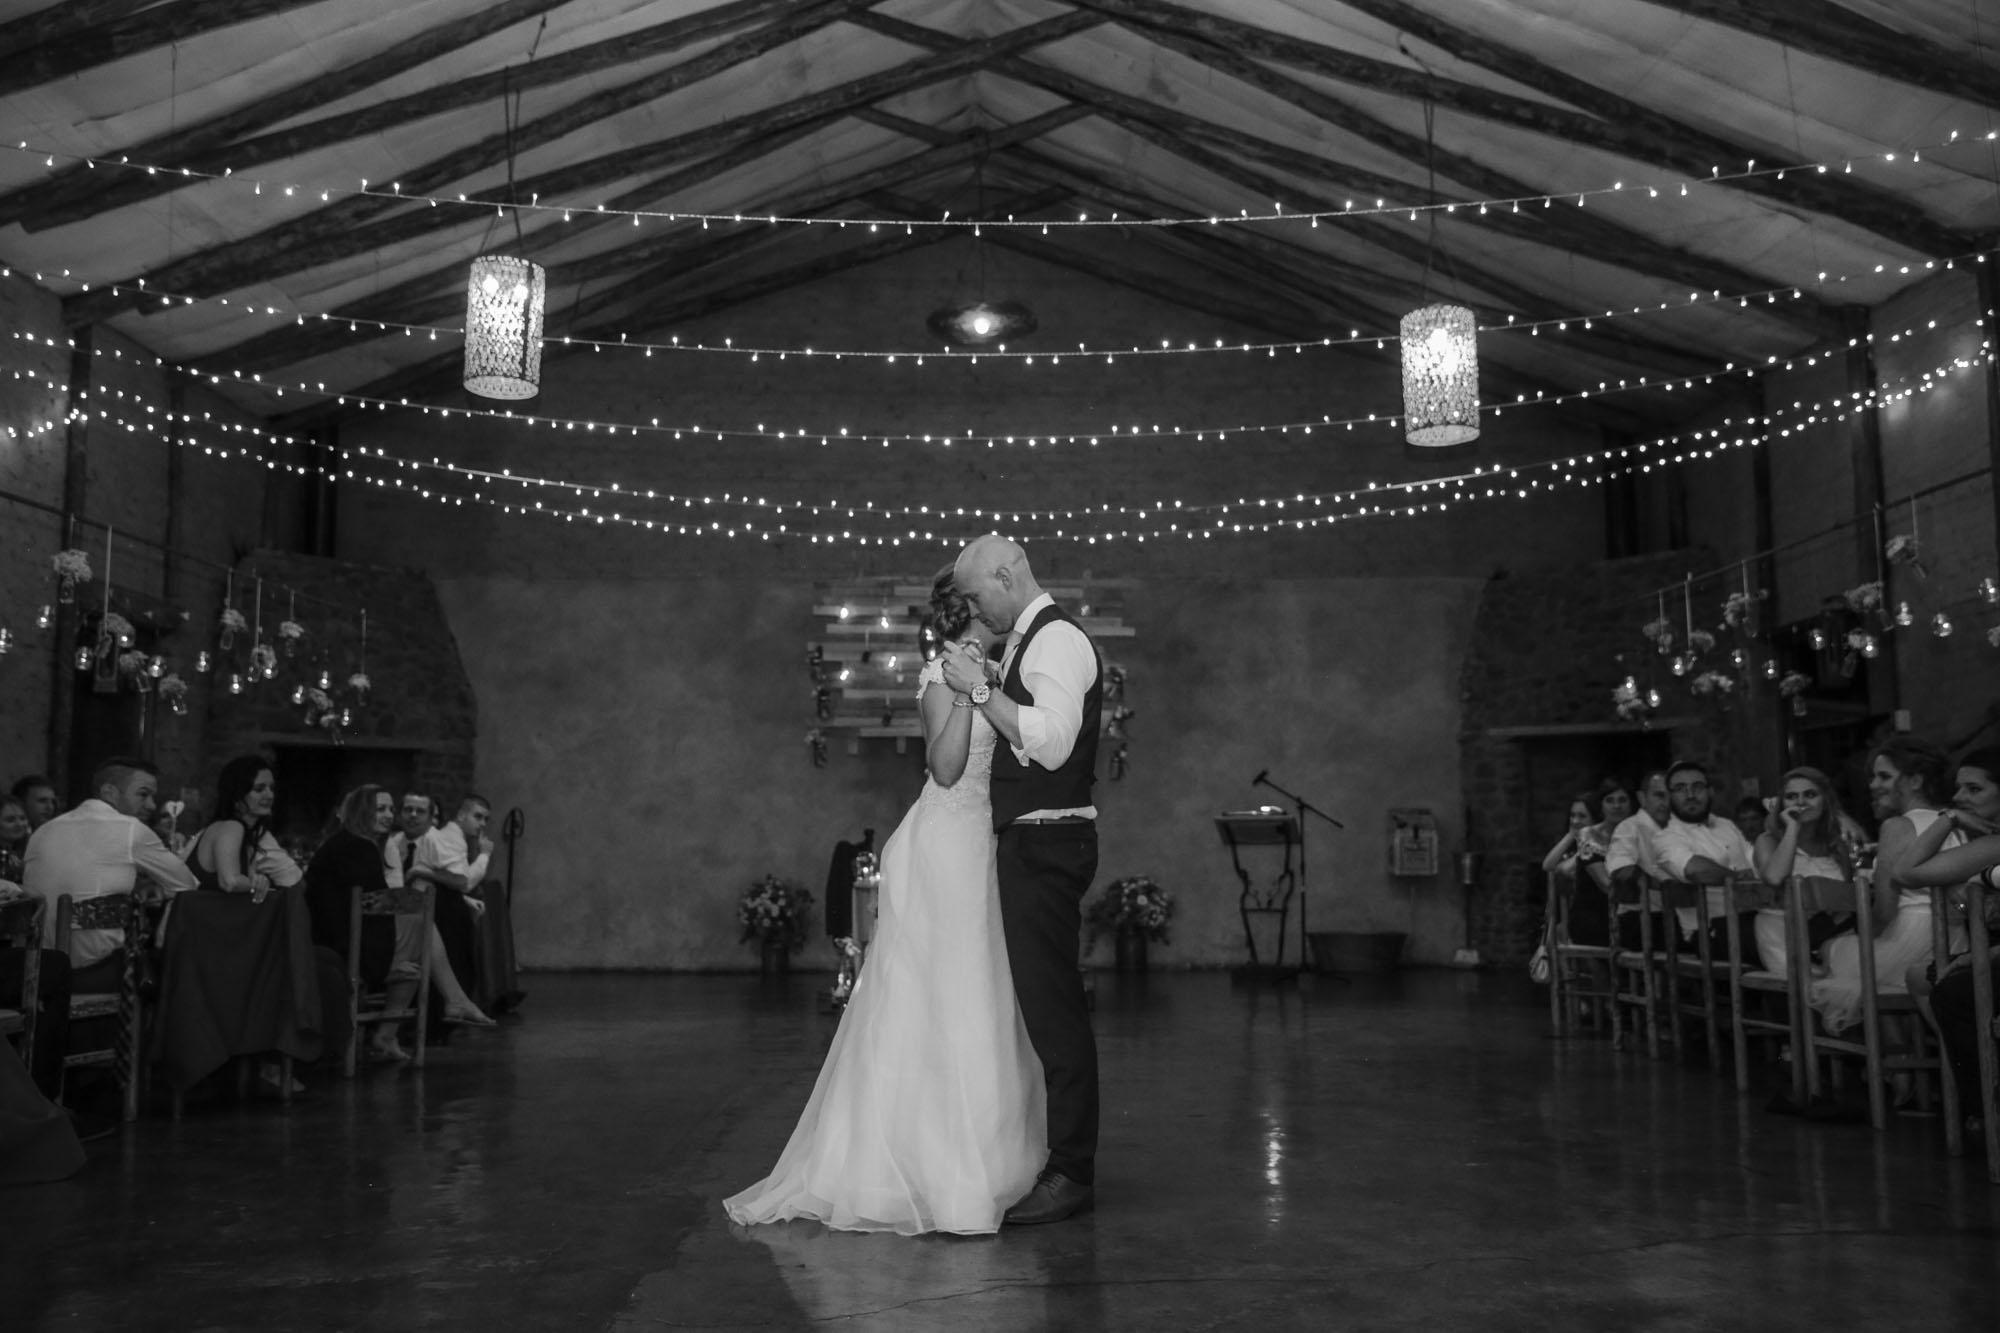 123-photojournalistic-wedding-photographers-johannesburg123-photojournalistic-wedding-photographers-johannesburg_a.jpg